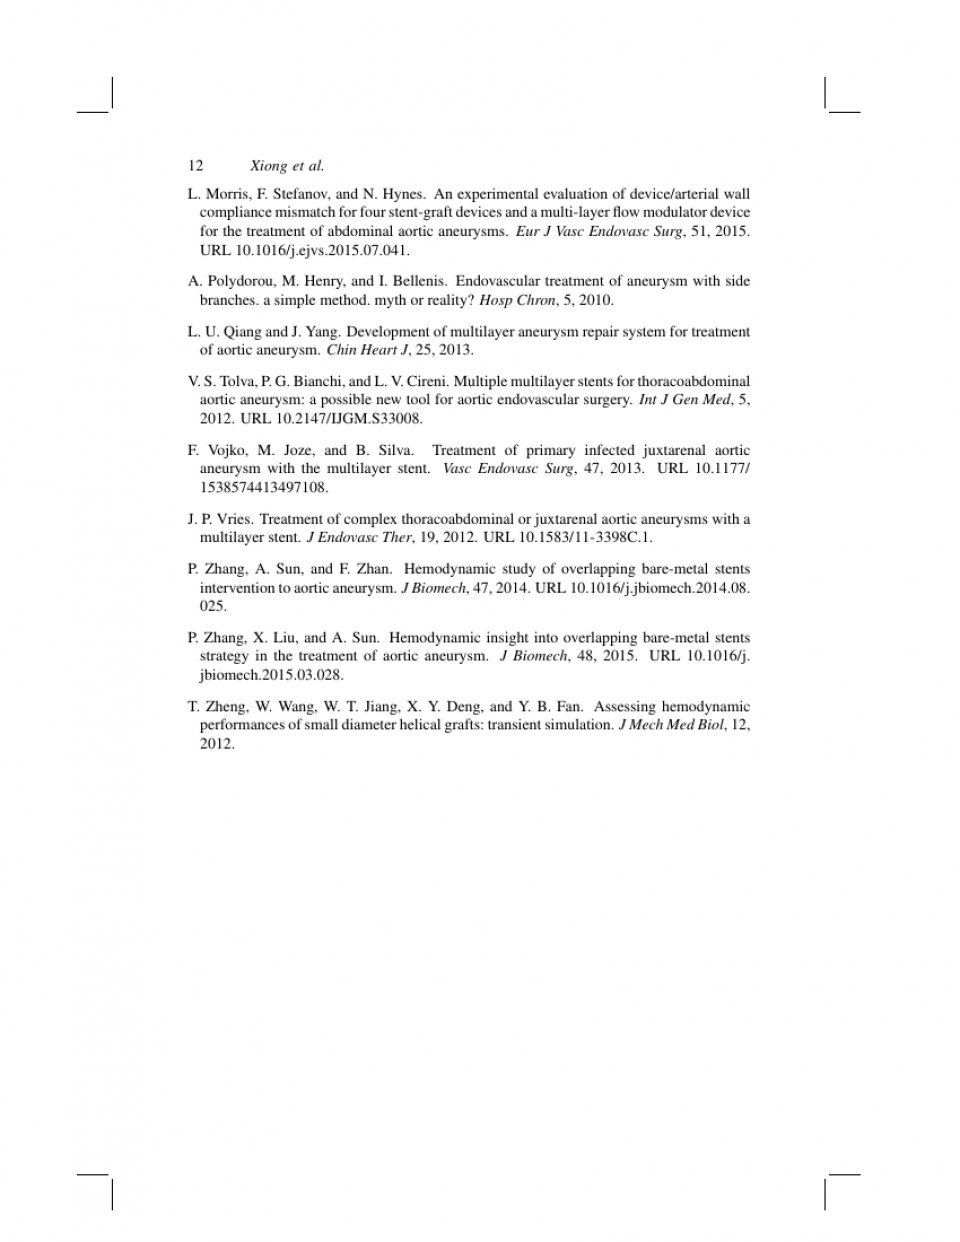 018 Toefl Ibt Essay Topics Output Striking 2015 960